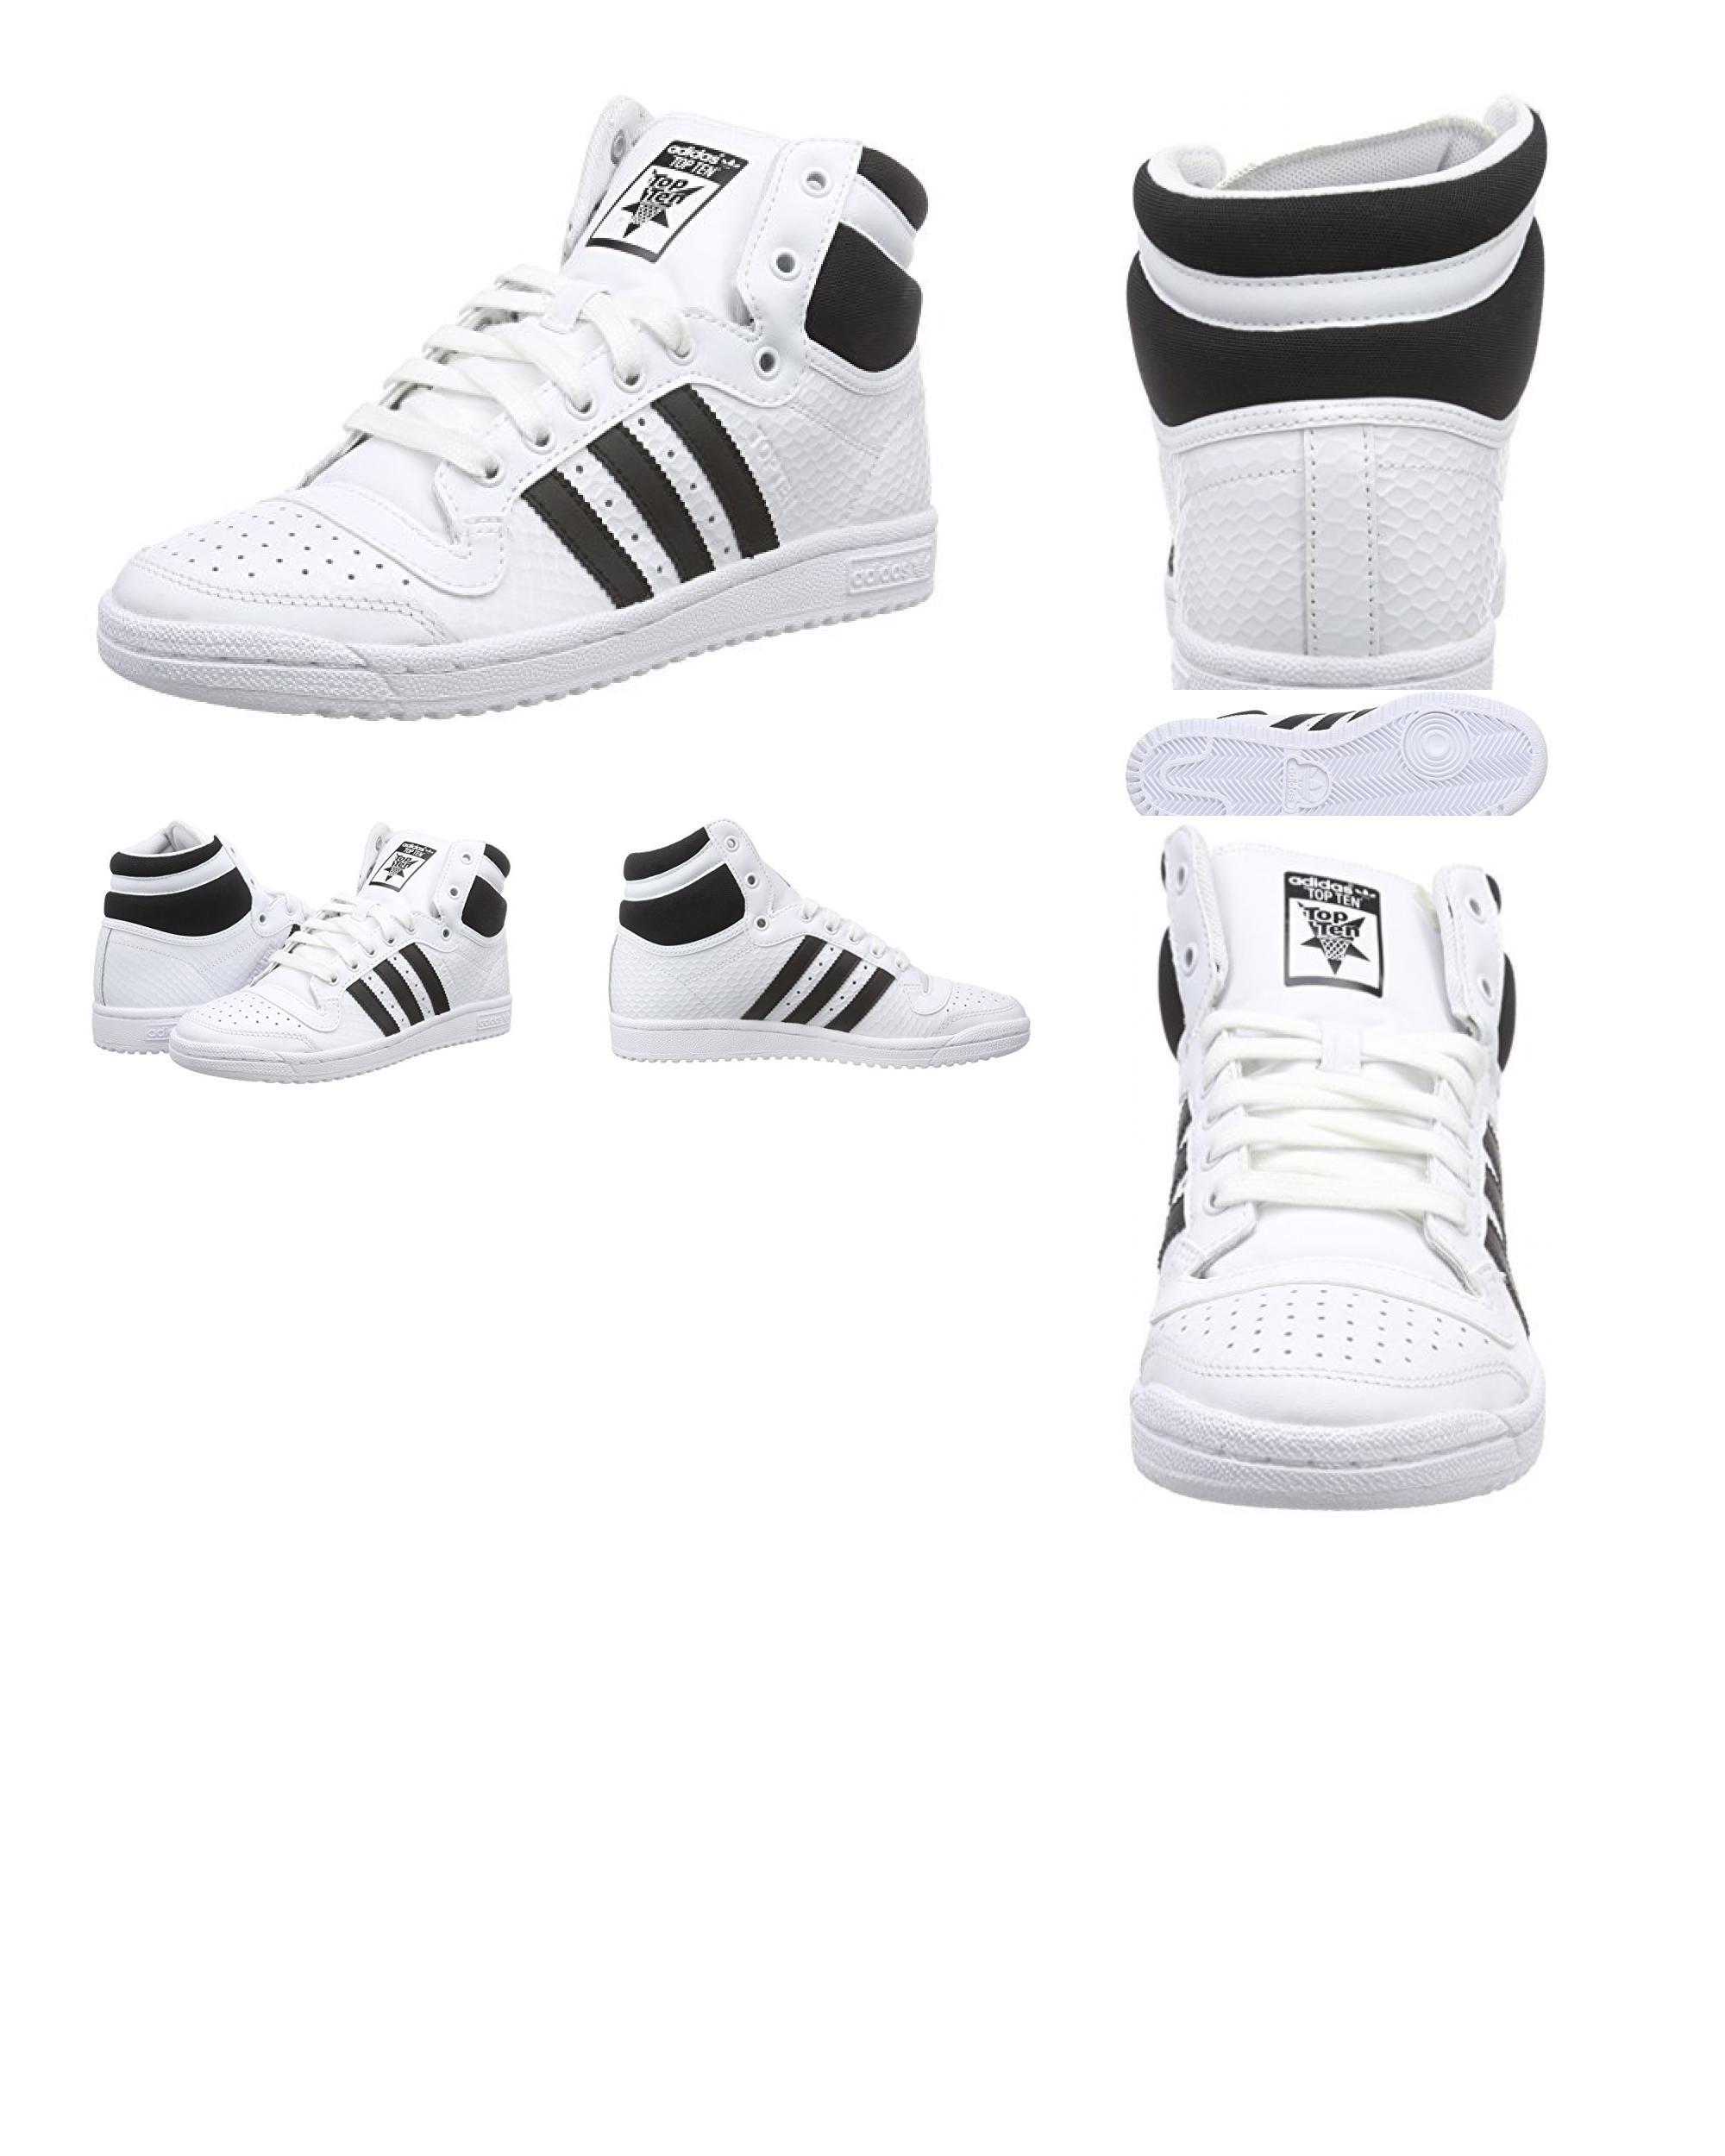 adidas #Top #Ten #Hi #Damen #Hohe #Sneakers | Sneaker damen